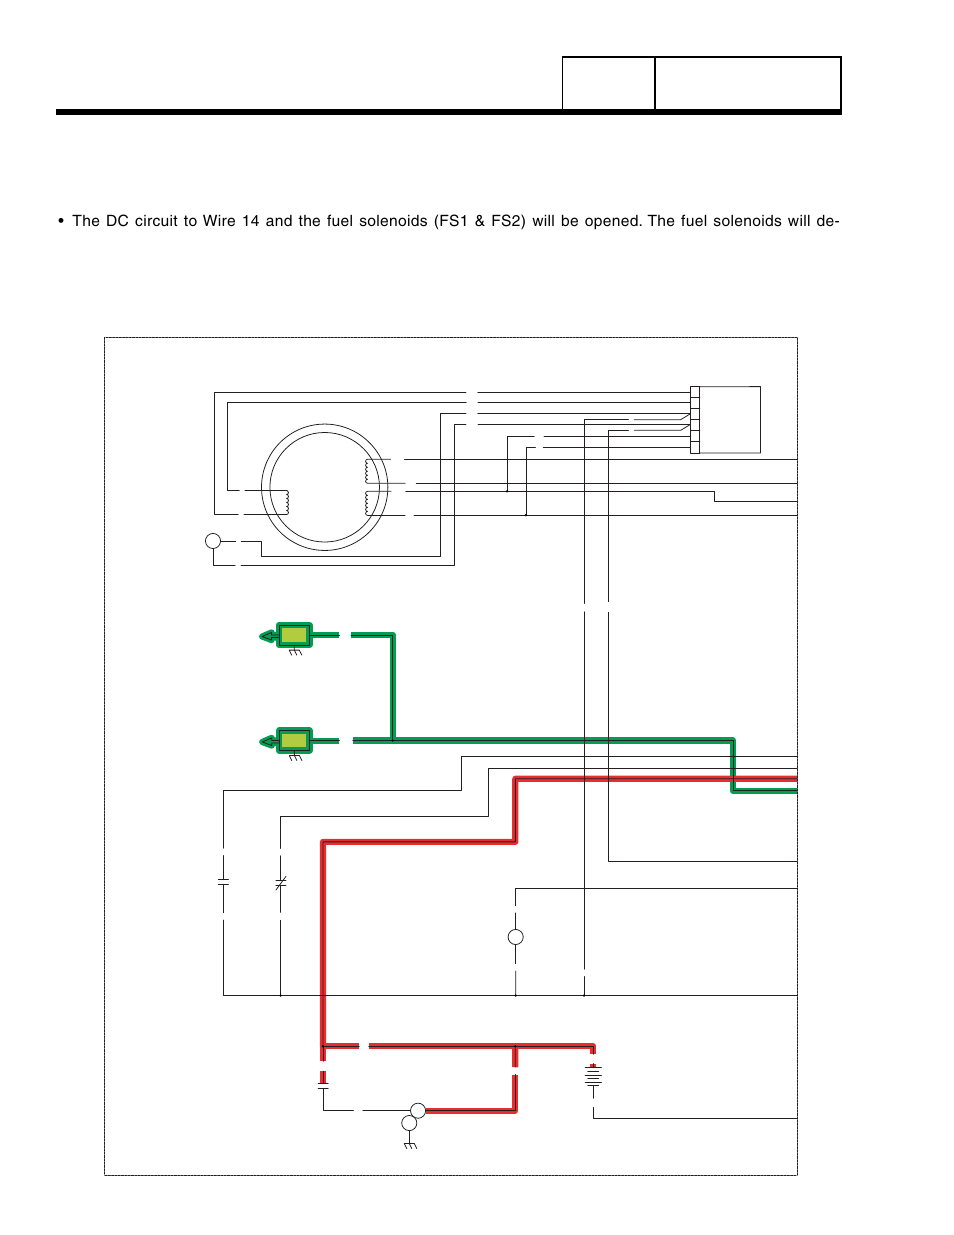 Engine shutdown, Part 4, Operational analysis | Page 116 | Generac Power  Systems 8